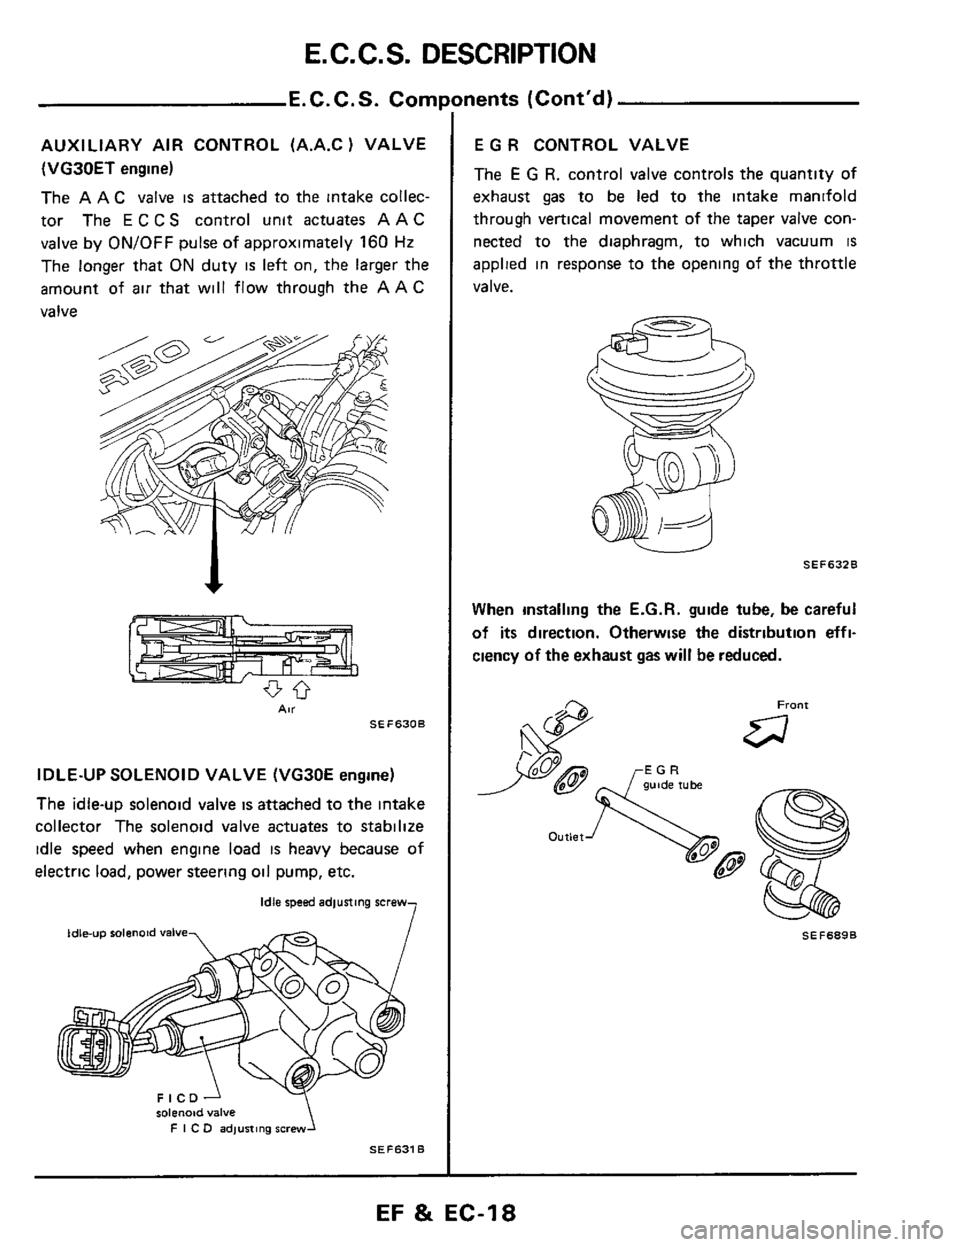 Nissan 300zx 1984 Z31 Engine Fuel And Emission Control System Vg30e Wiring Diagram Workshop Manual